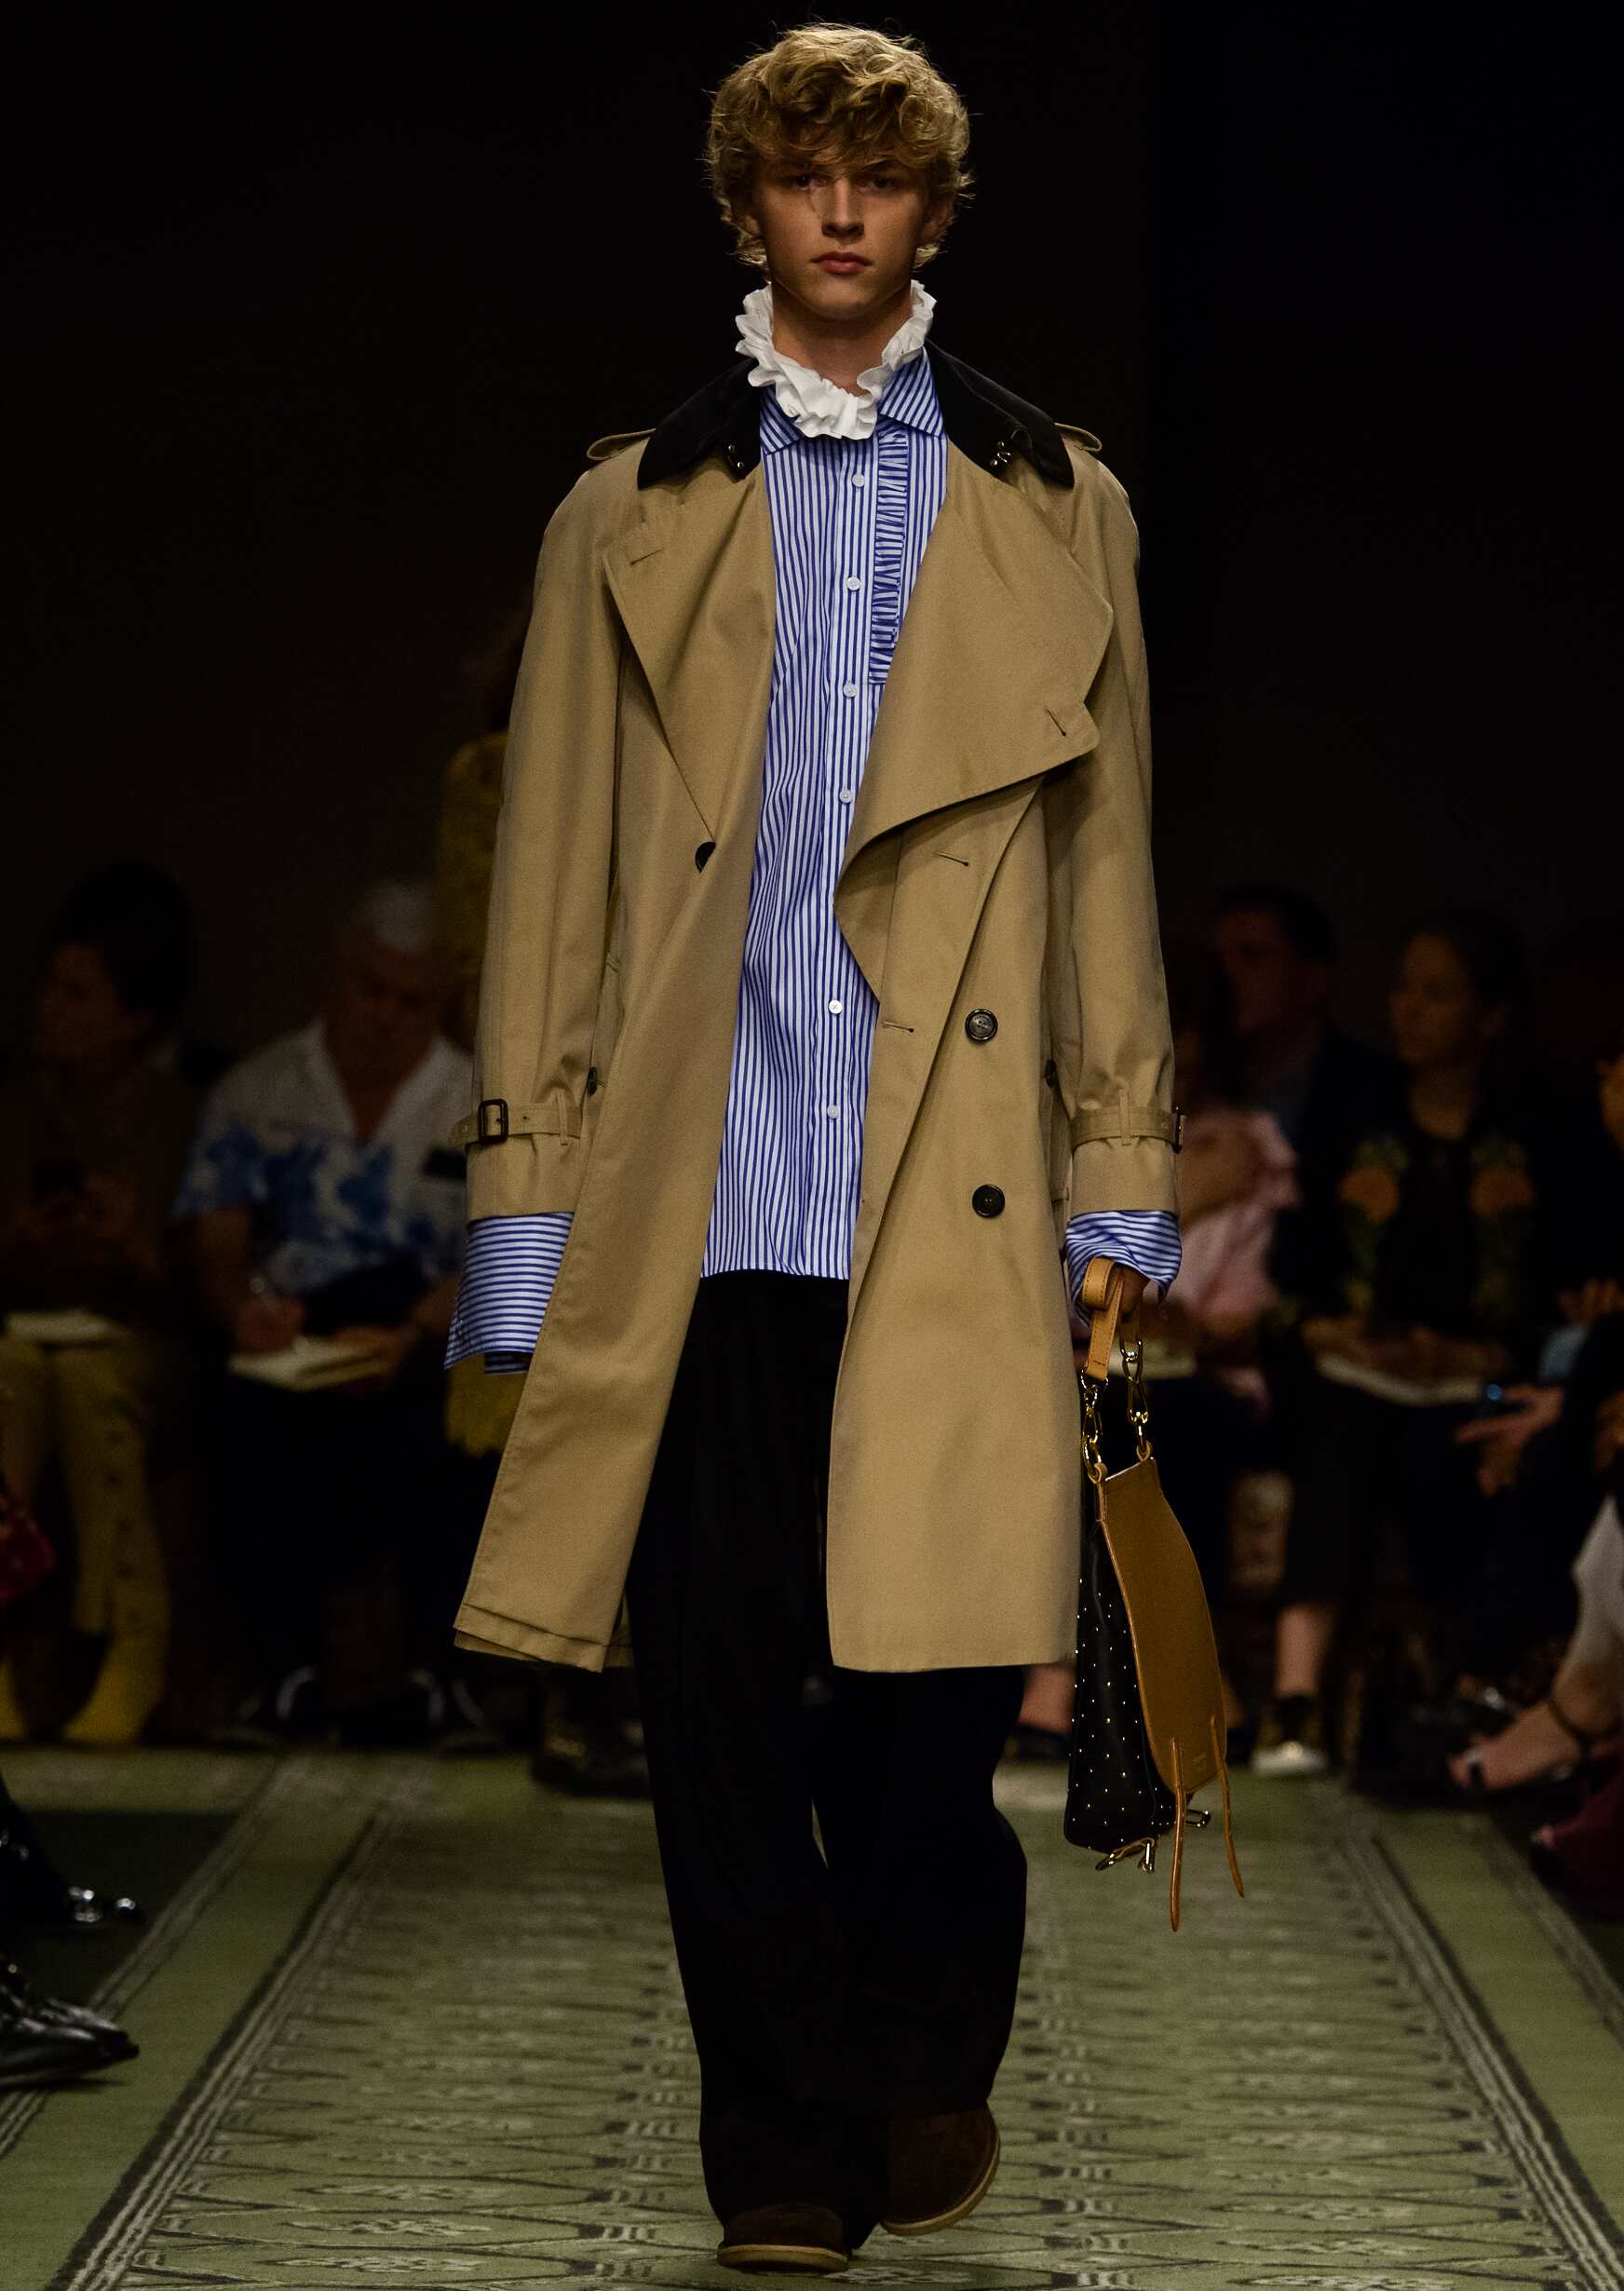 Male Model Burberry Catwalk London Fashion Week Runway